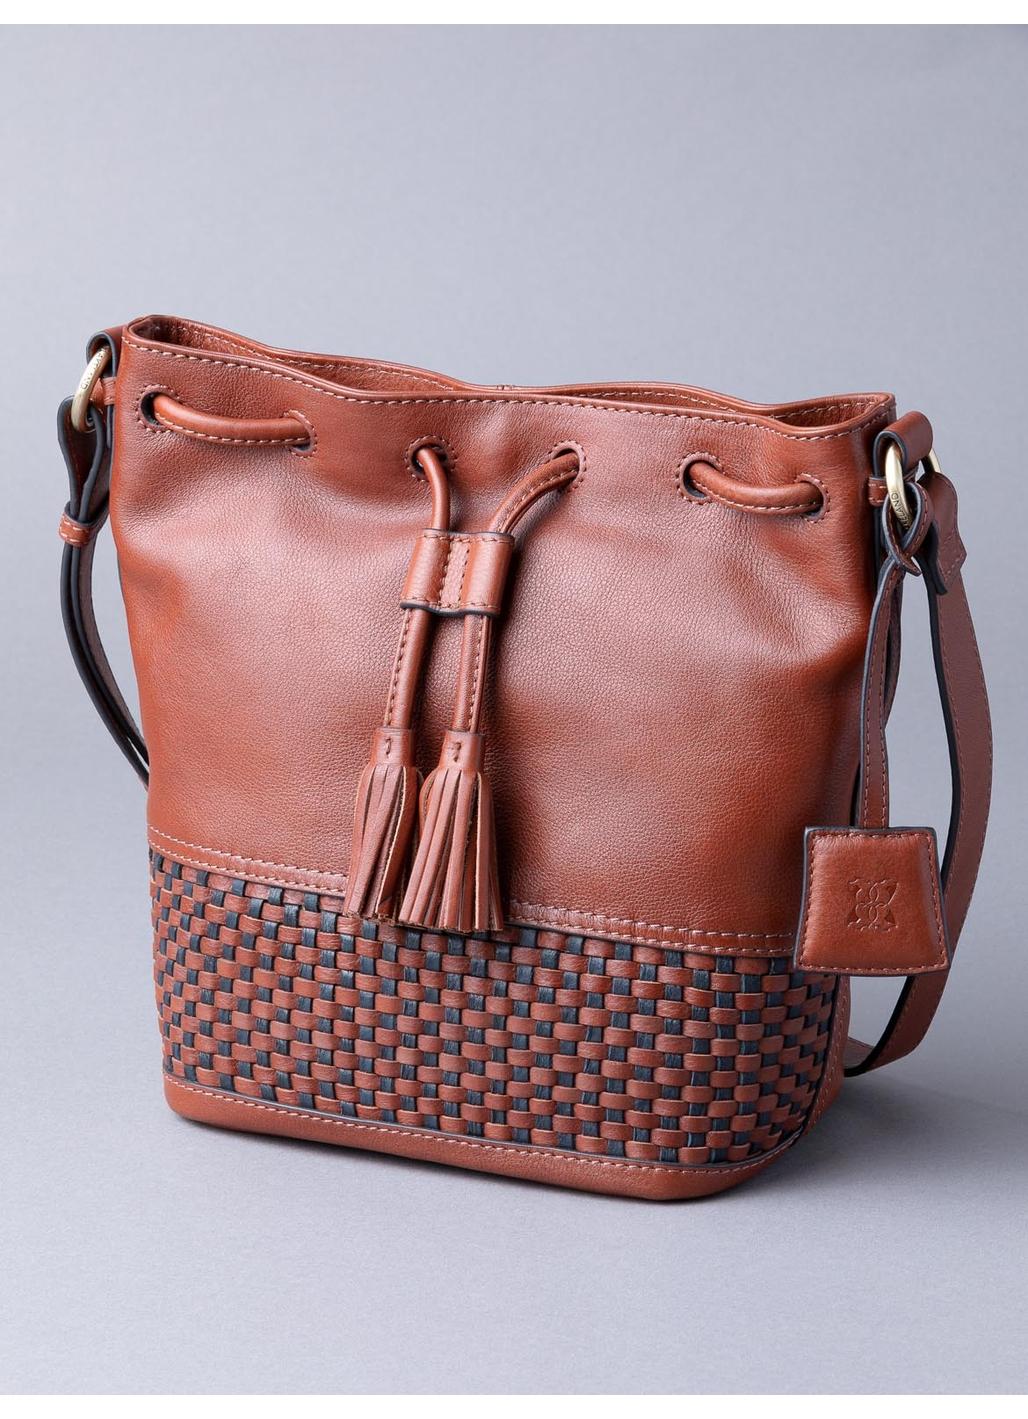 Waverton Leather Duffle Bag in Cognac